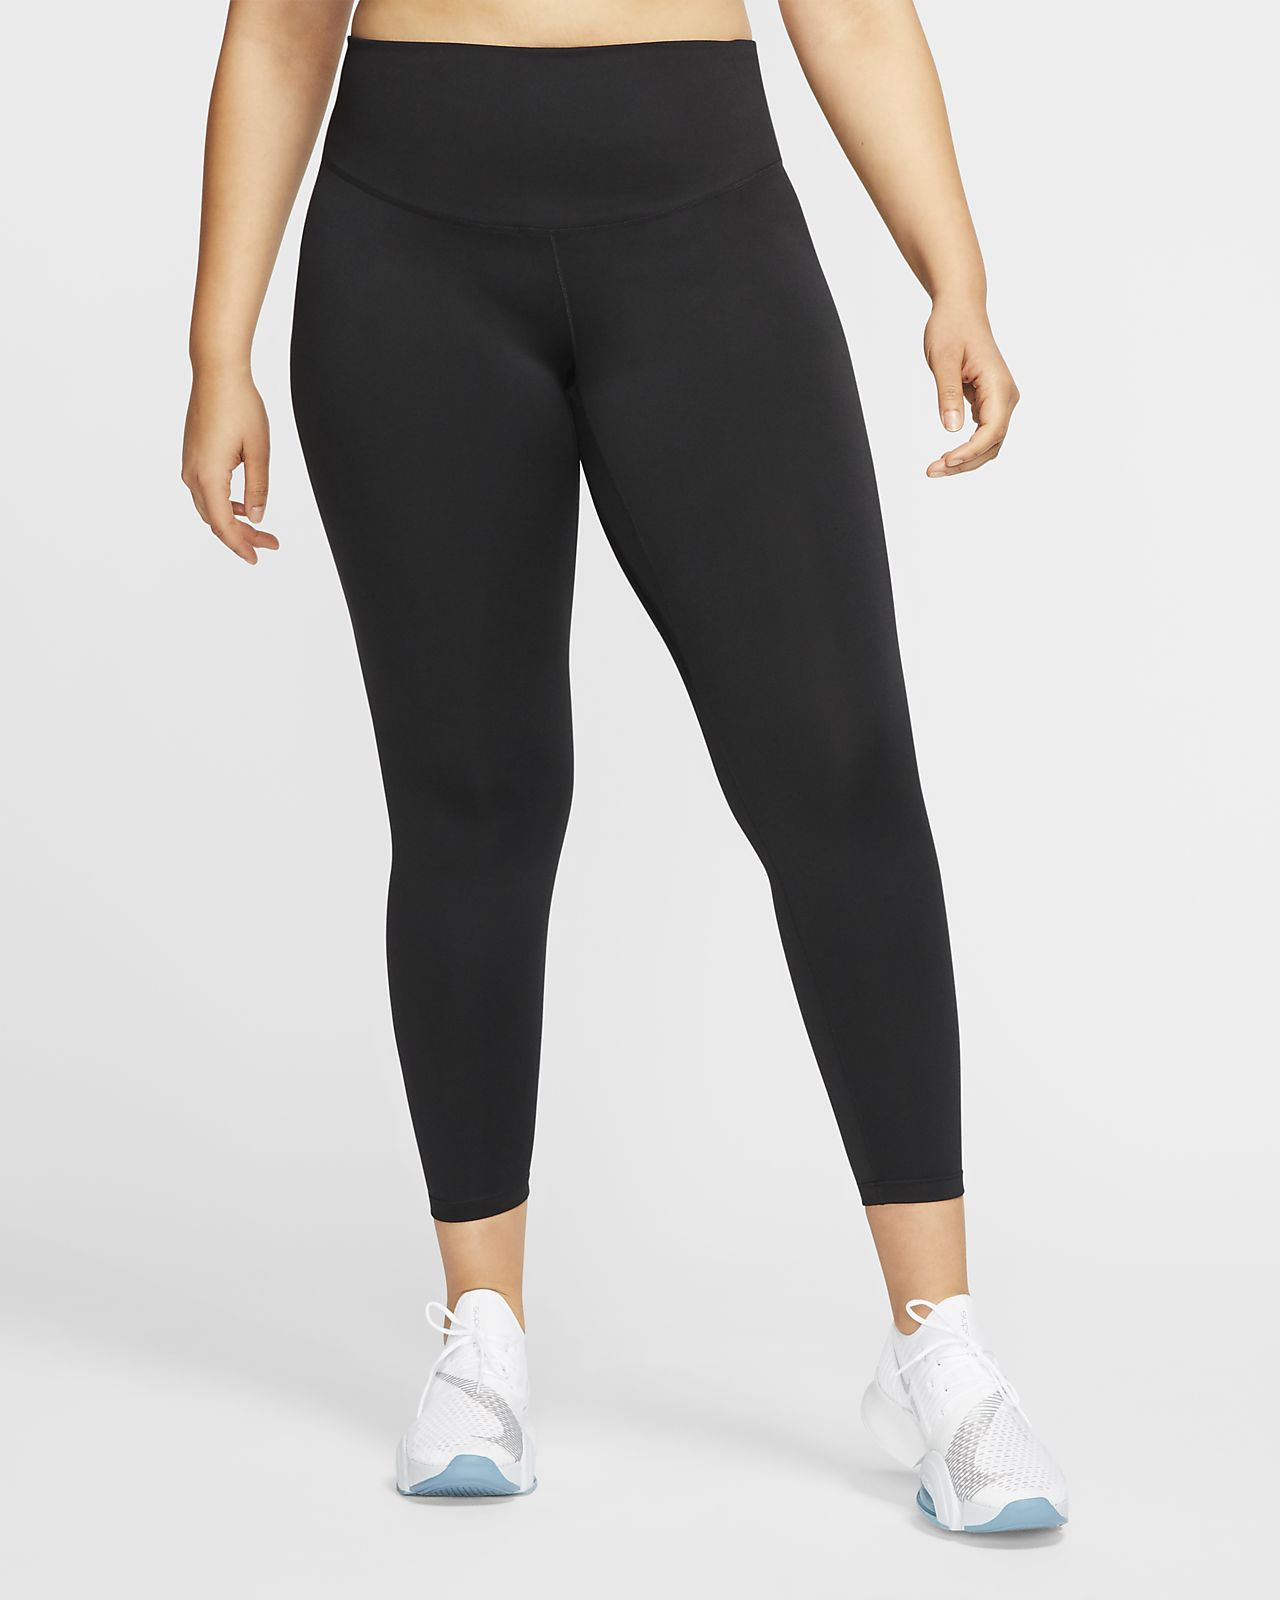 Legging Nike One pour Femme (grande taille)